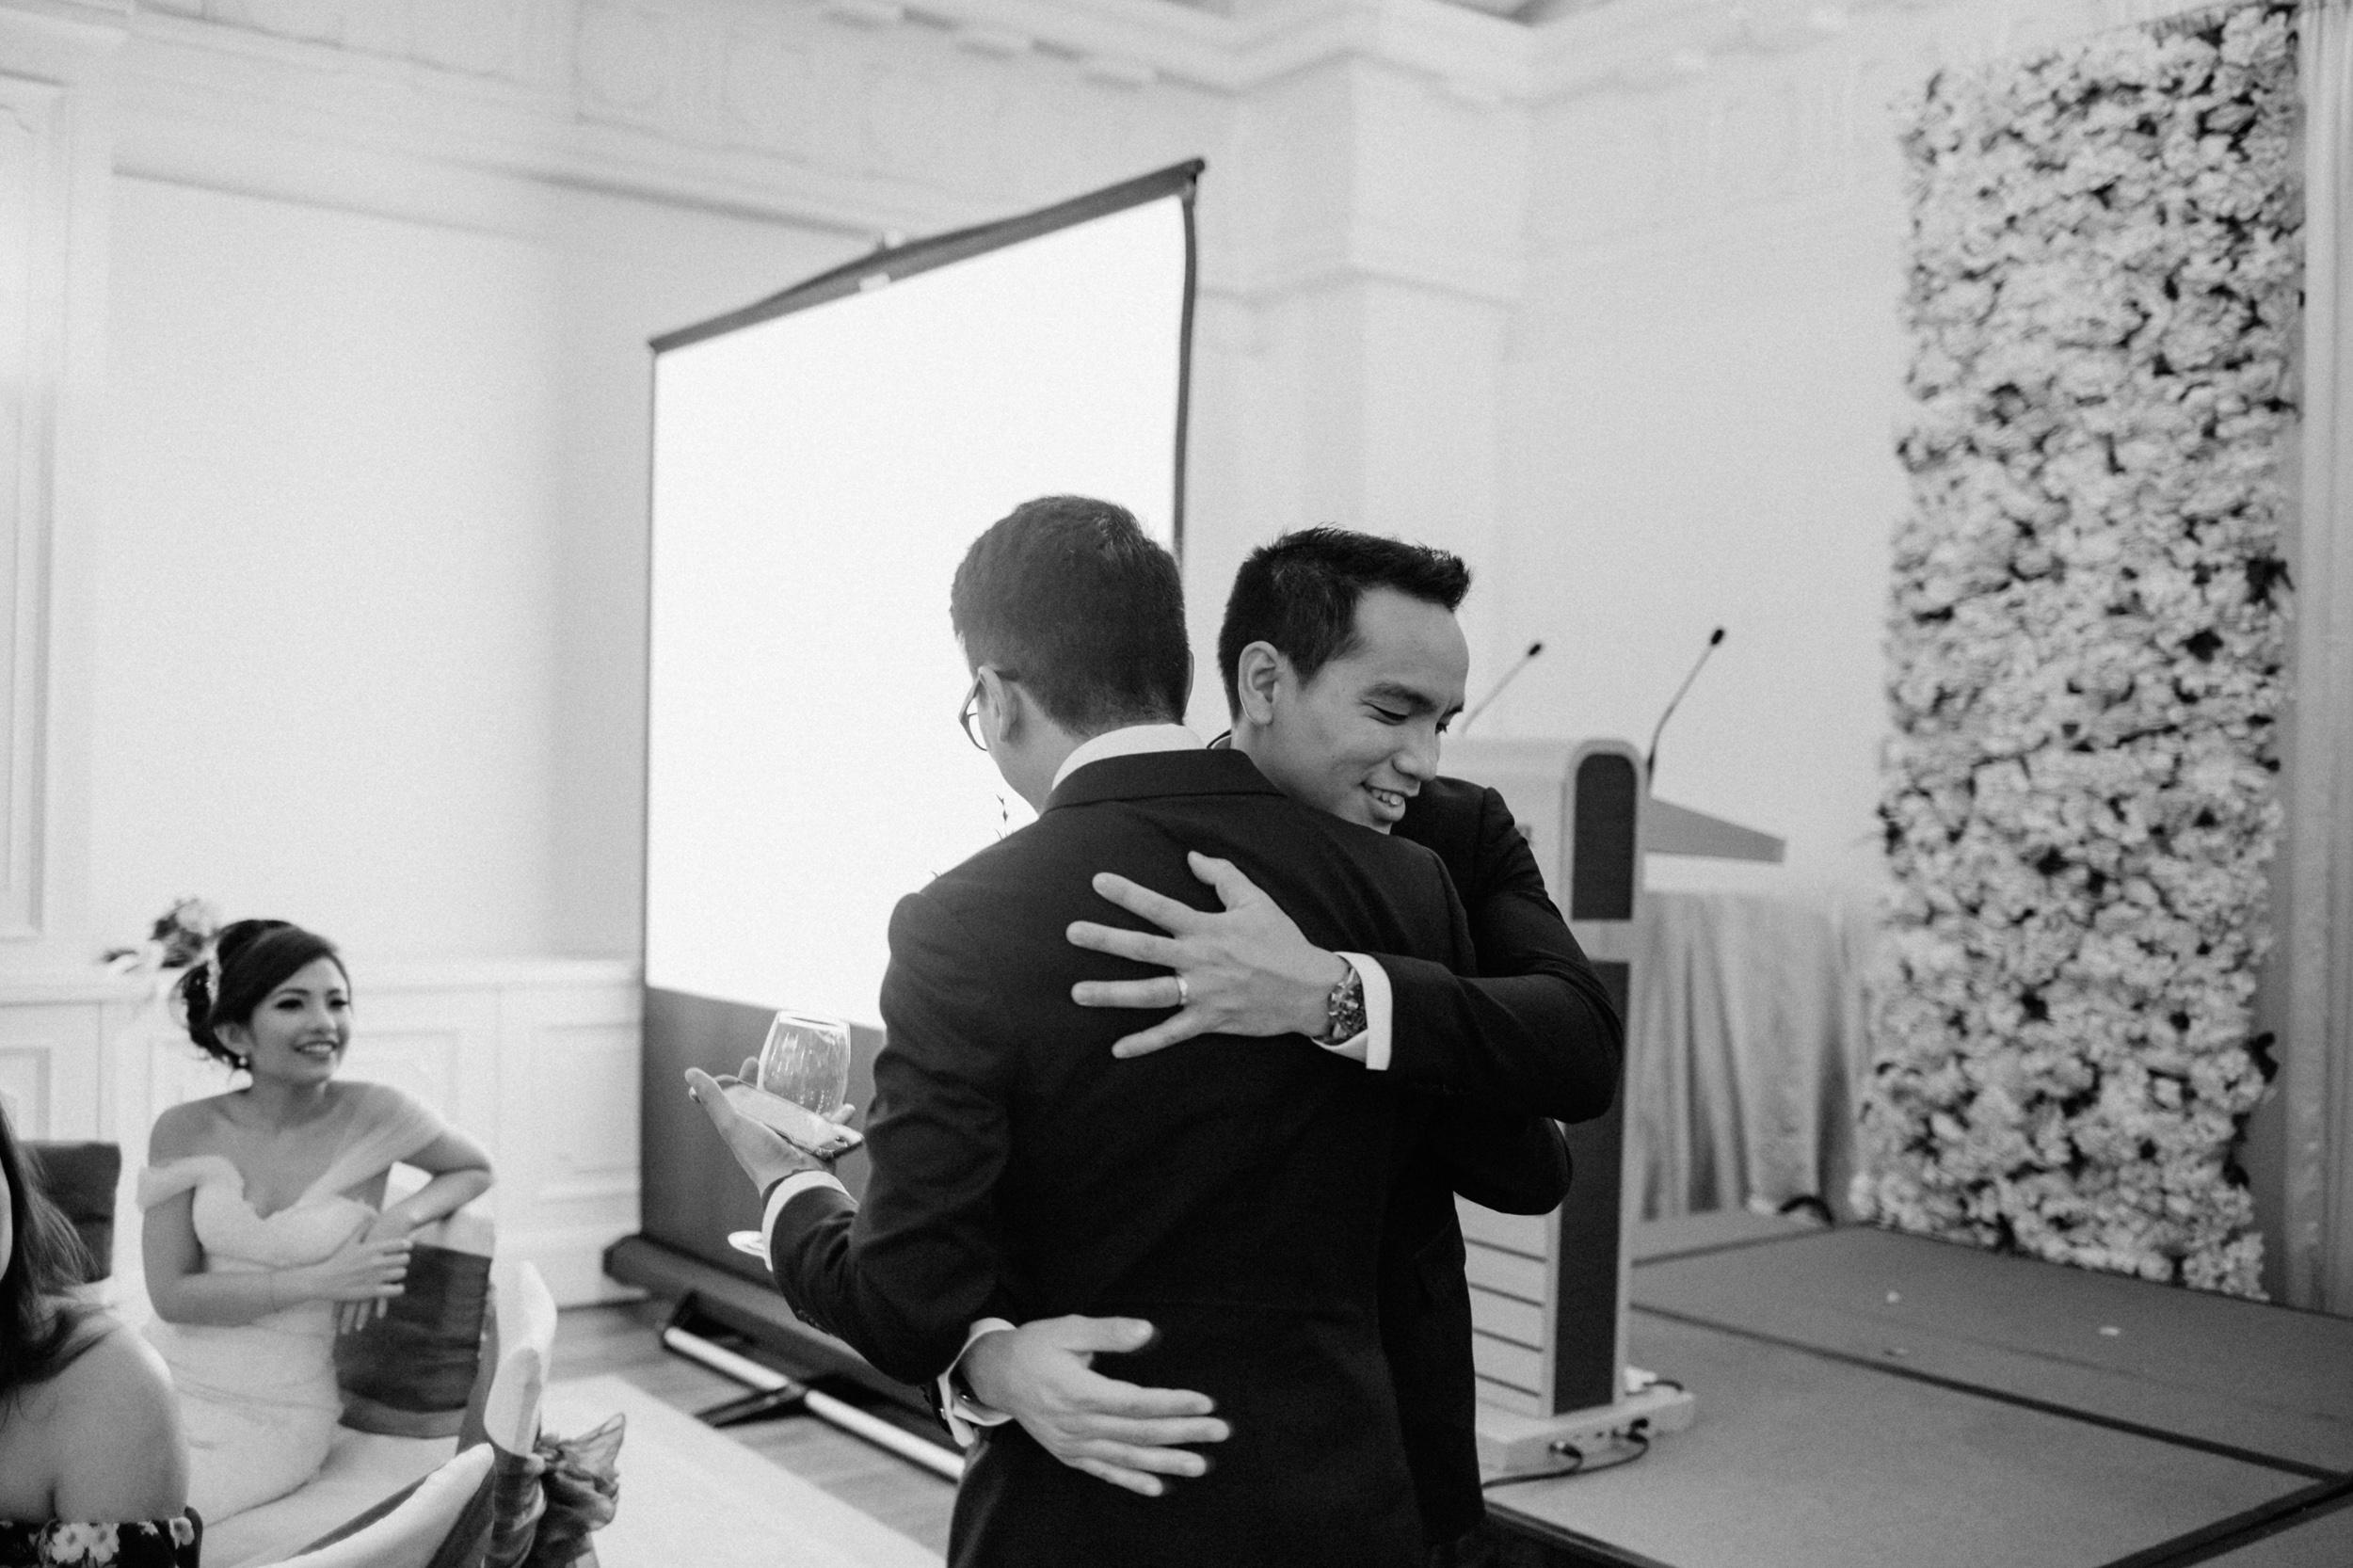 singapore-wedding-photographer-cheryl-matthew-fullerton-hotel-wedding-66.jpg